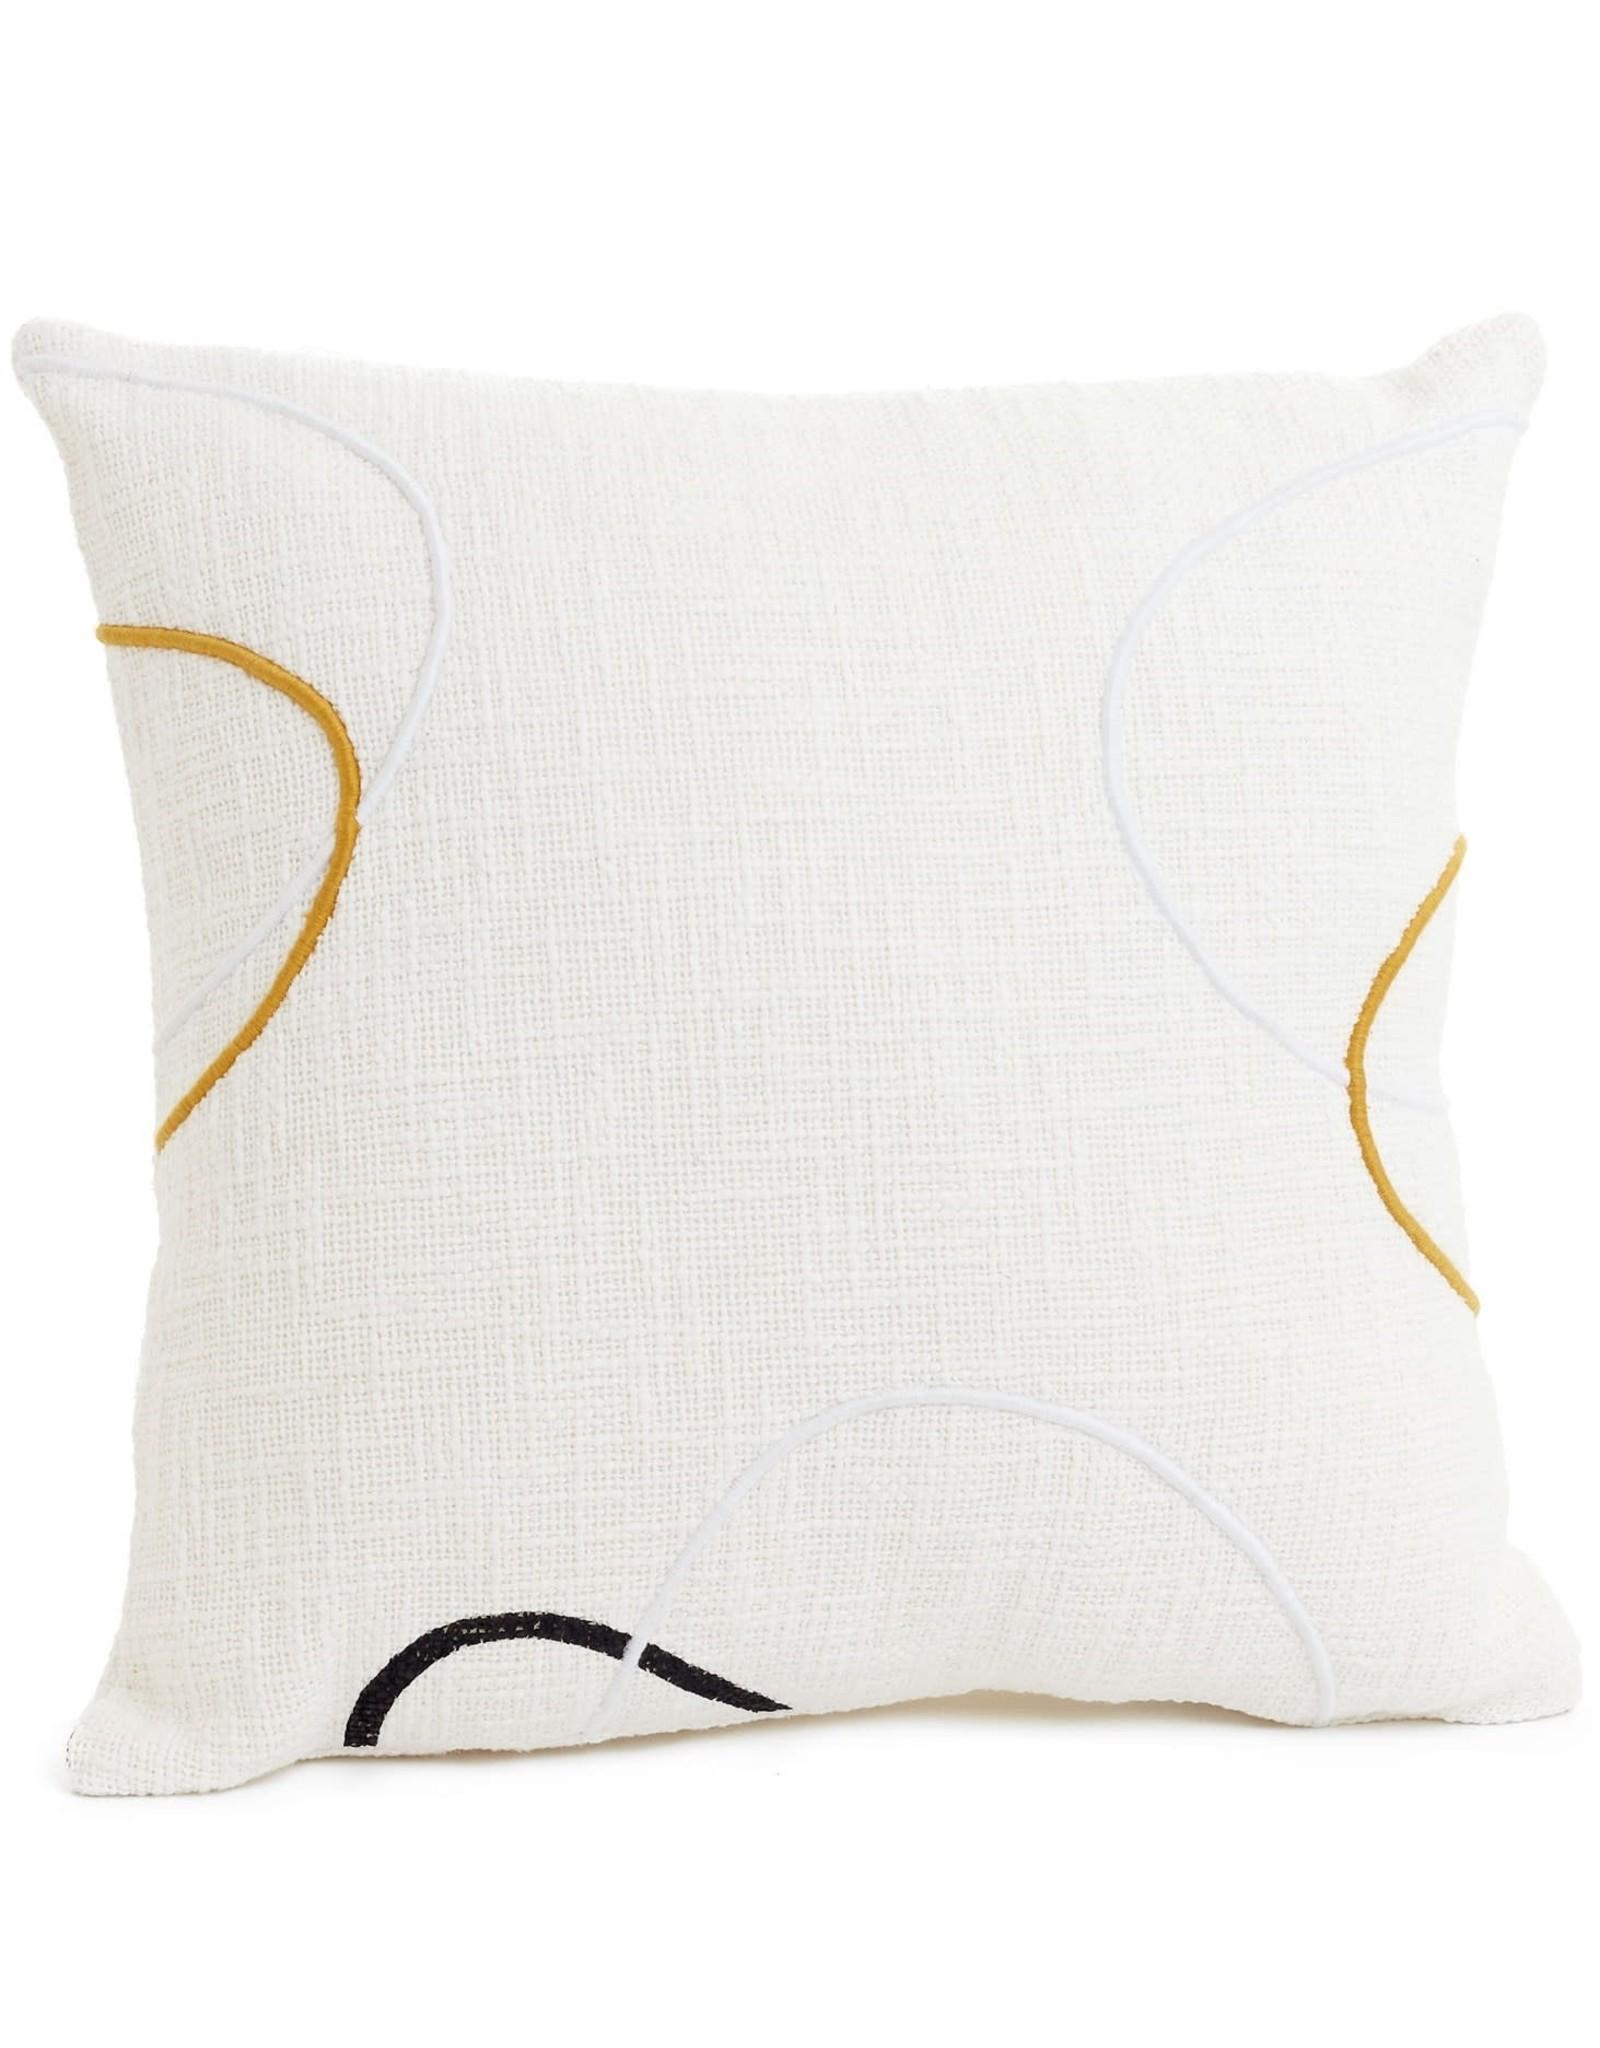 Embroidered Cushion - Ecru/Saffron/Black